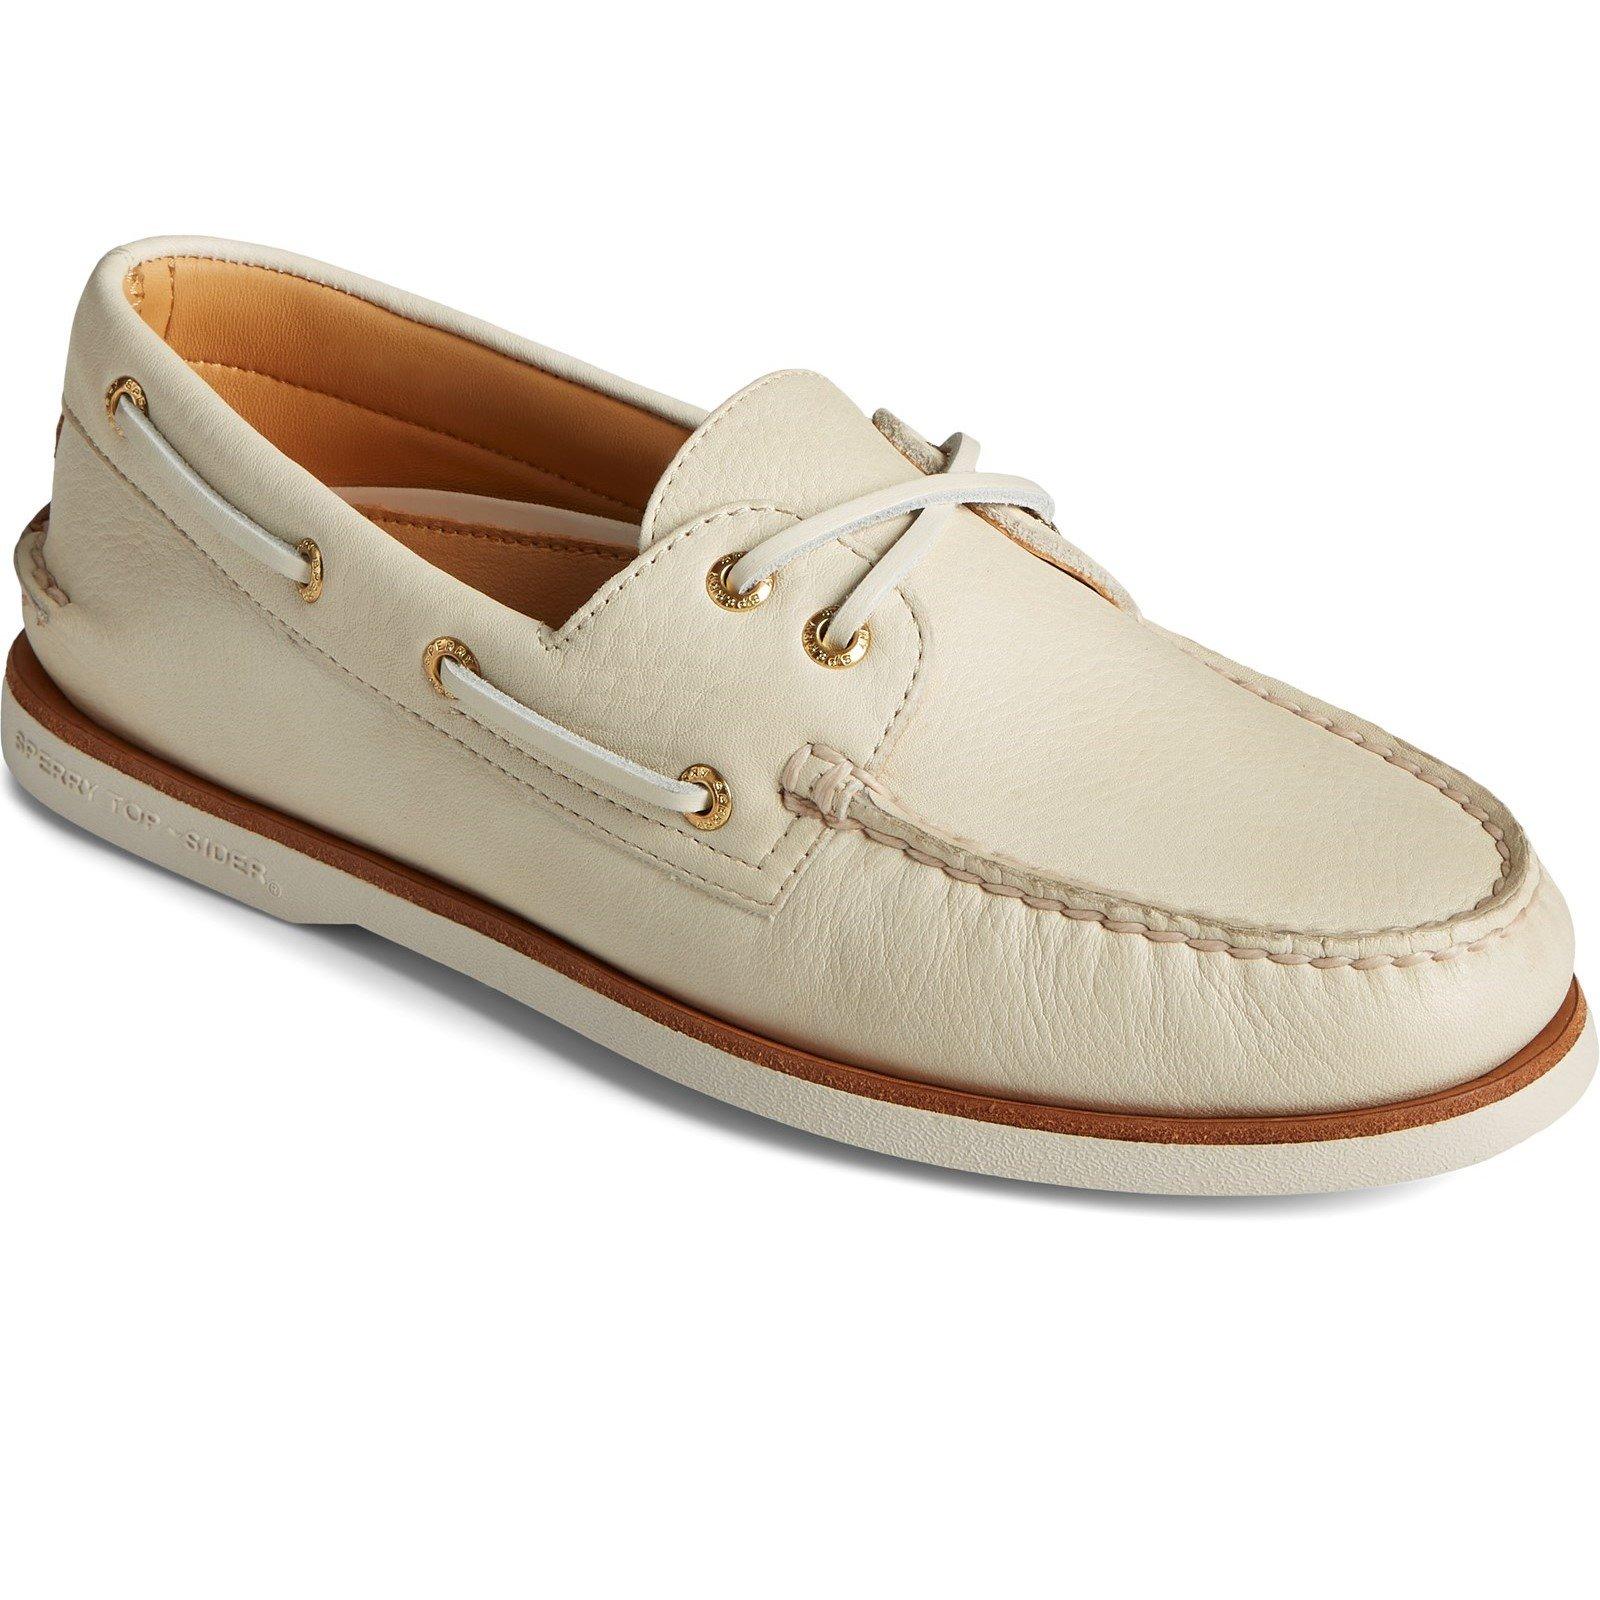 Sperry Men's A/O 2-Eye Boat Shoe Various Colours 32926 - Cream 10.5